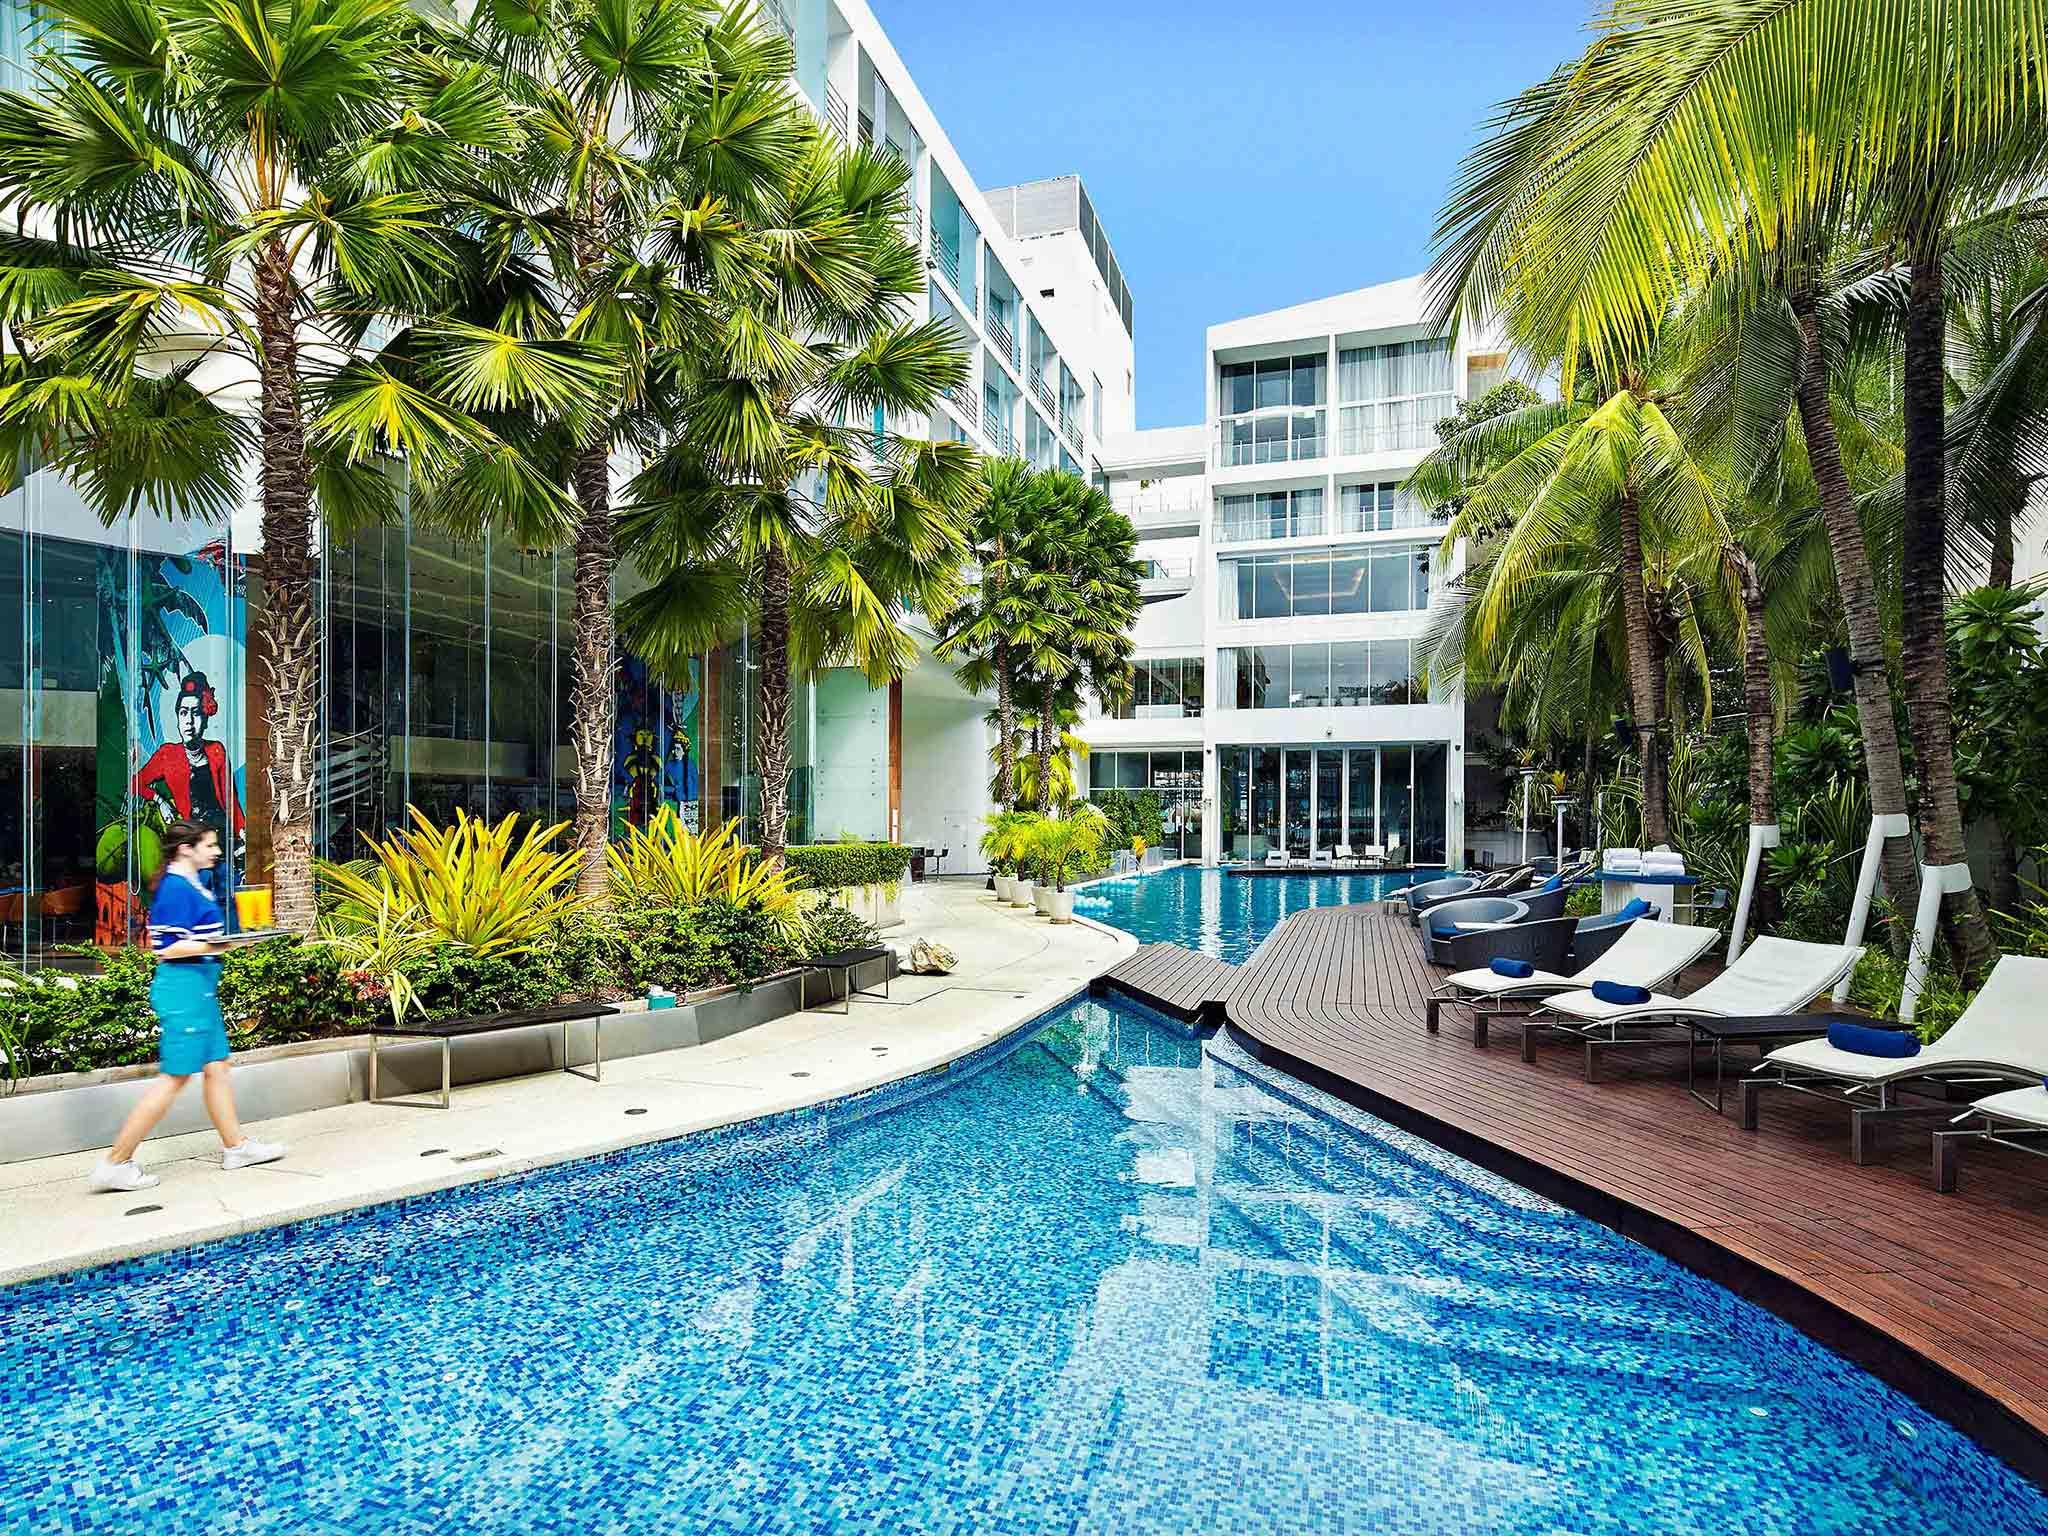 Hôtel - Baraquda Pattaya - MGallery by Sofitel